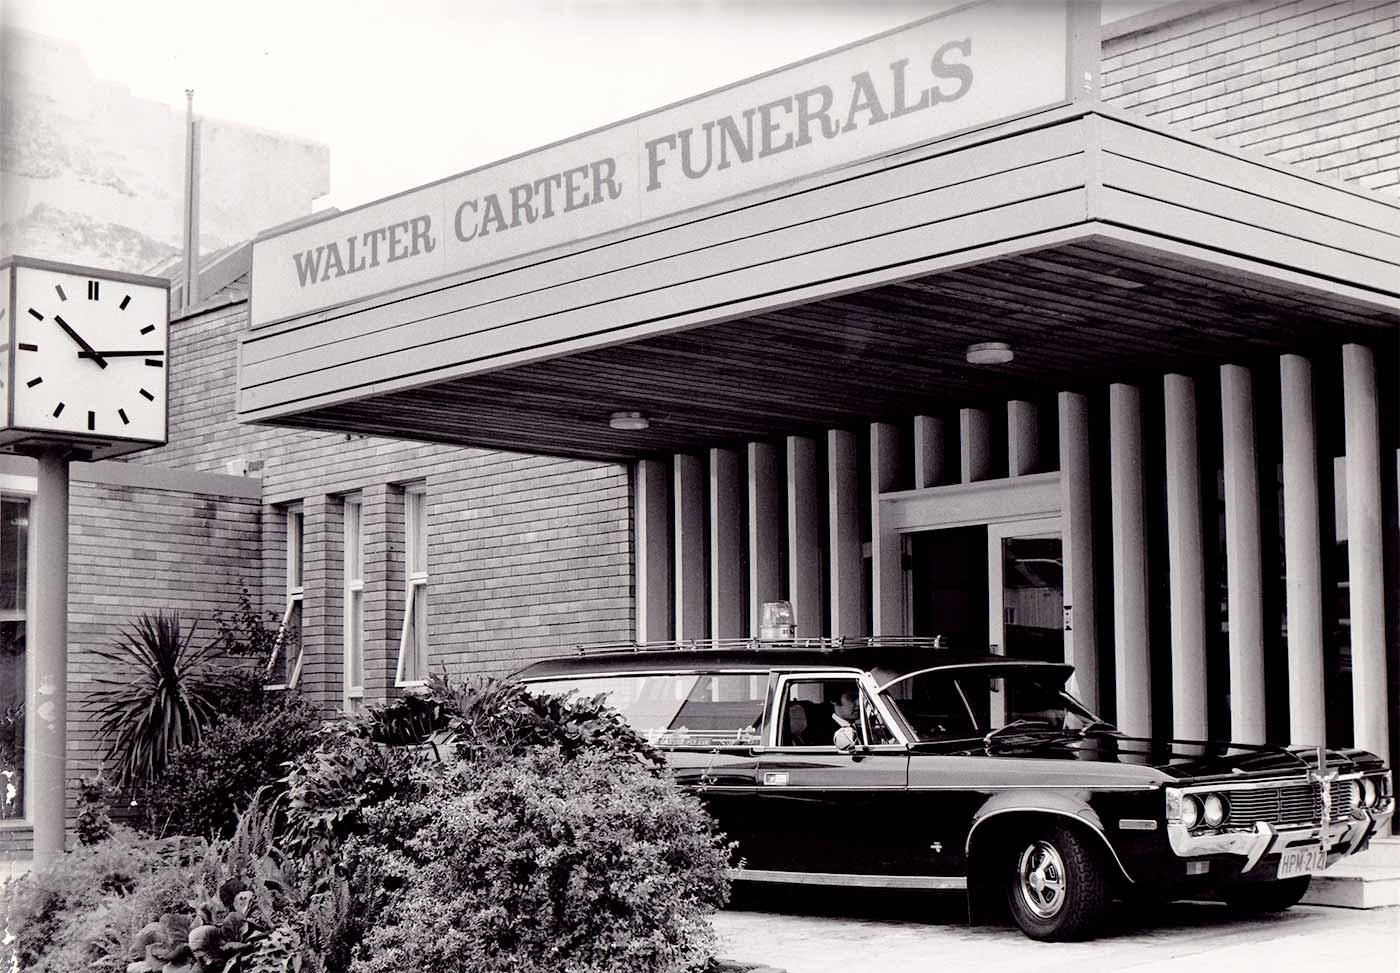 Expanded Walter Carter Funerals Premises